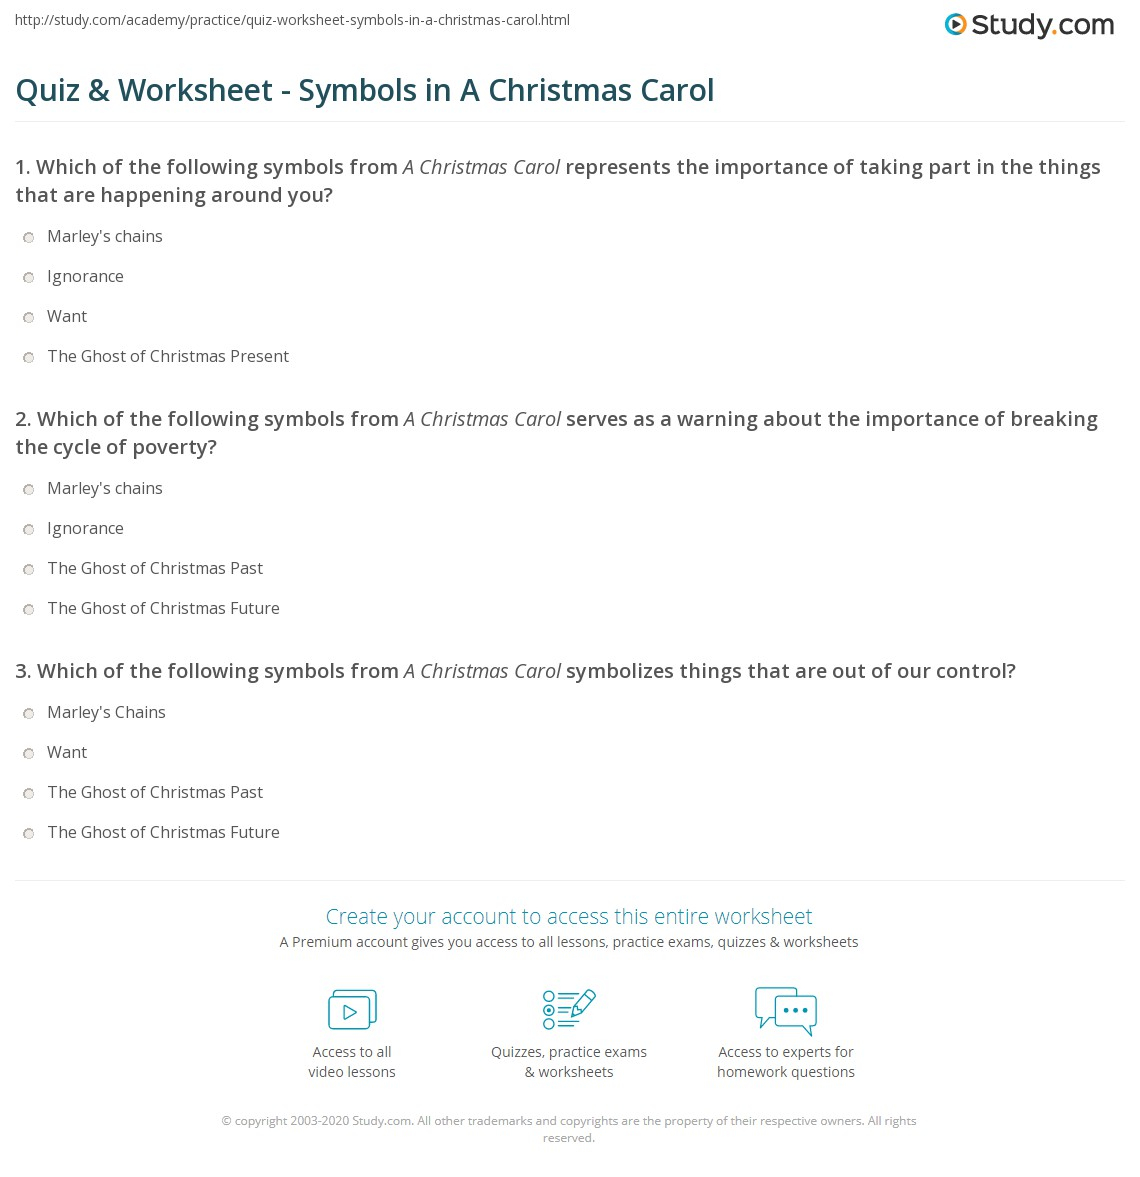 Quiz & Worksheet - Symbols In A Christmas Carol | Study